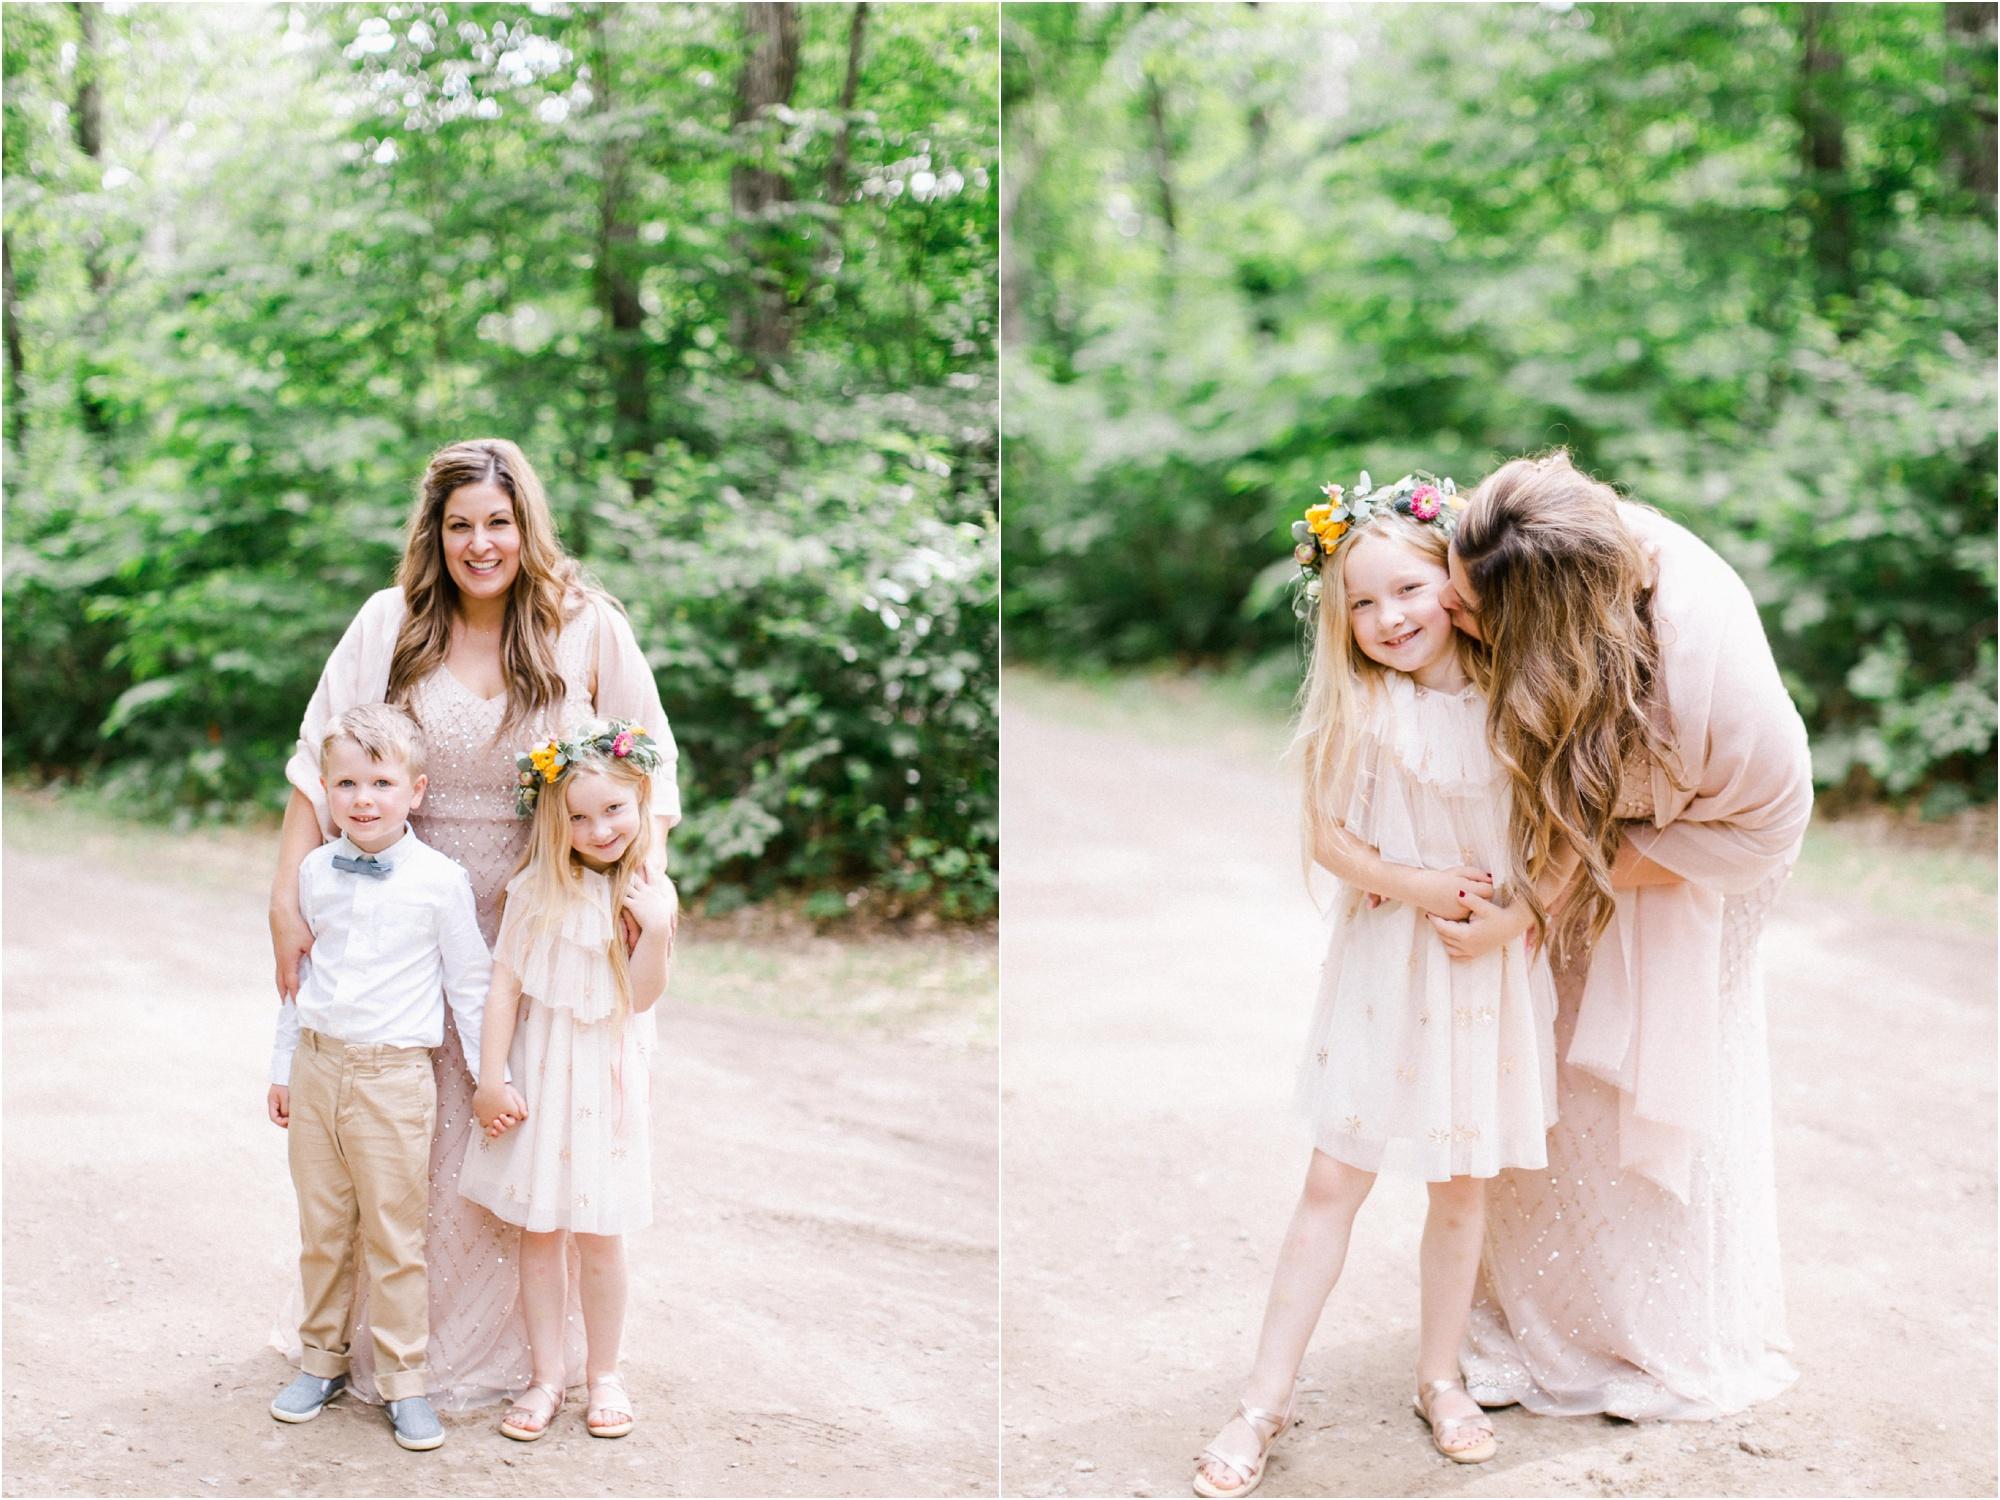 Wedding Photography Brainerd MN Aimee Jobe Photography Private Lake Residence Bloom Designs_0105.jpg